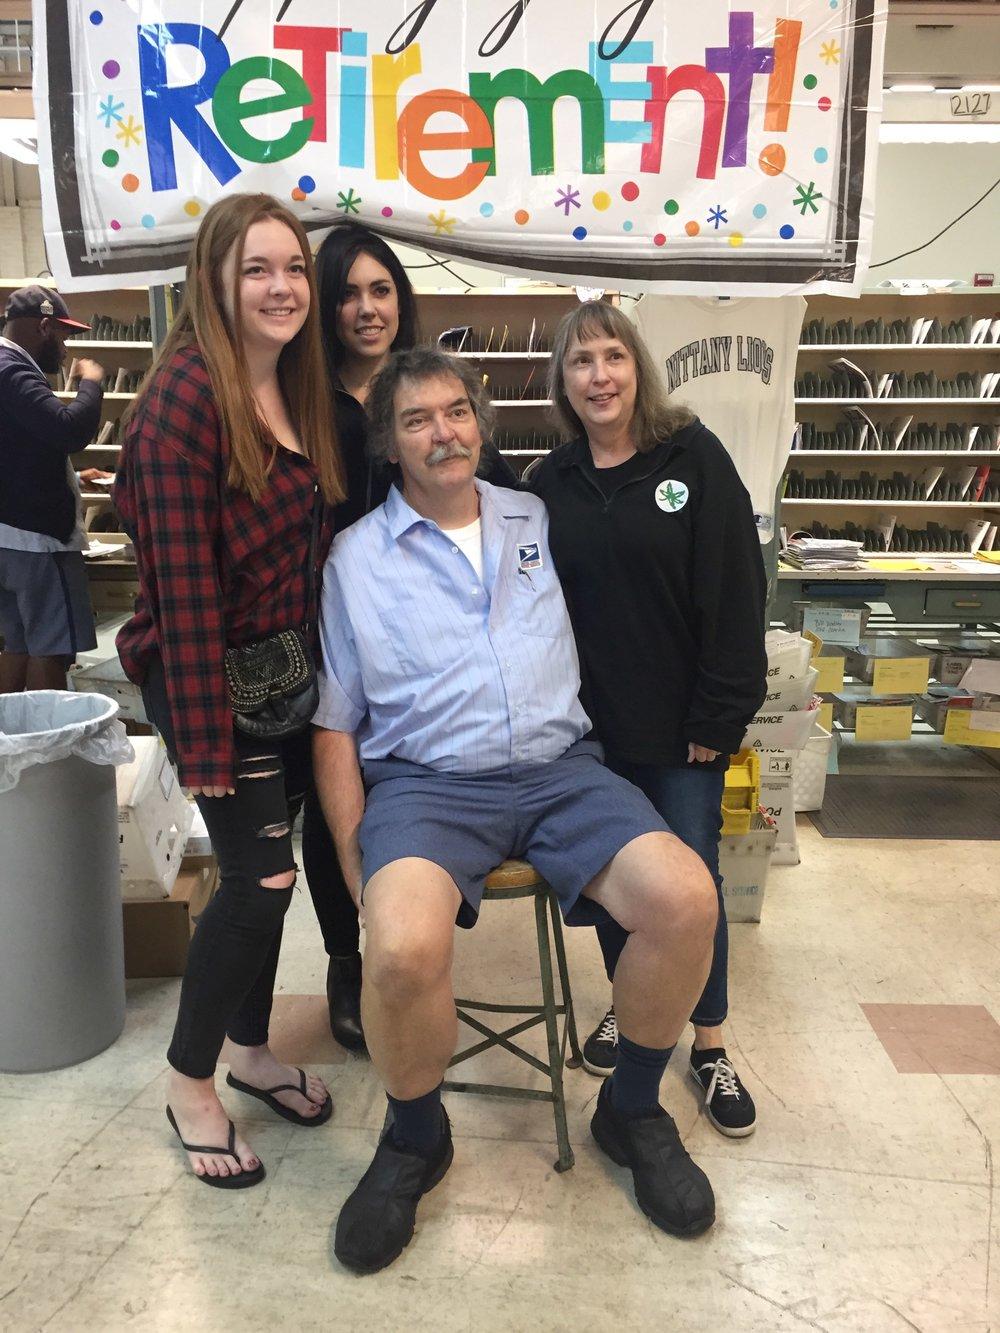 Chris Clawson & family